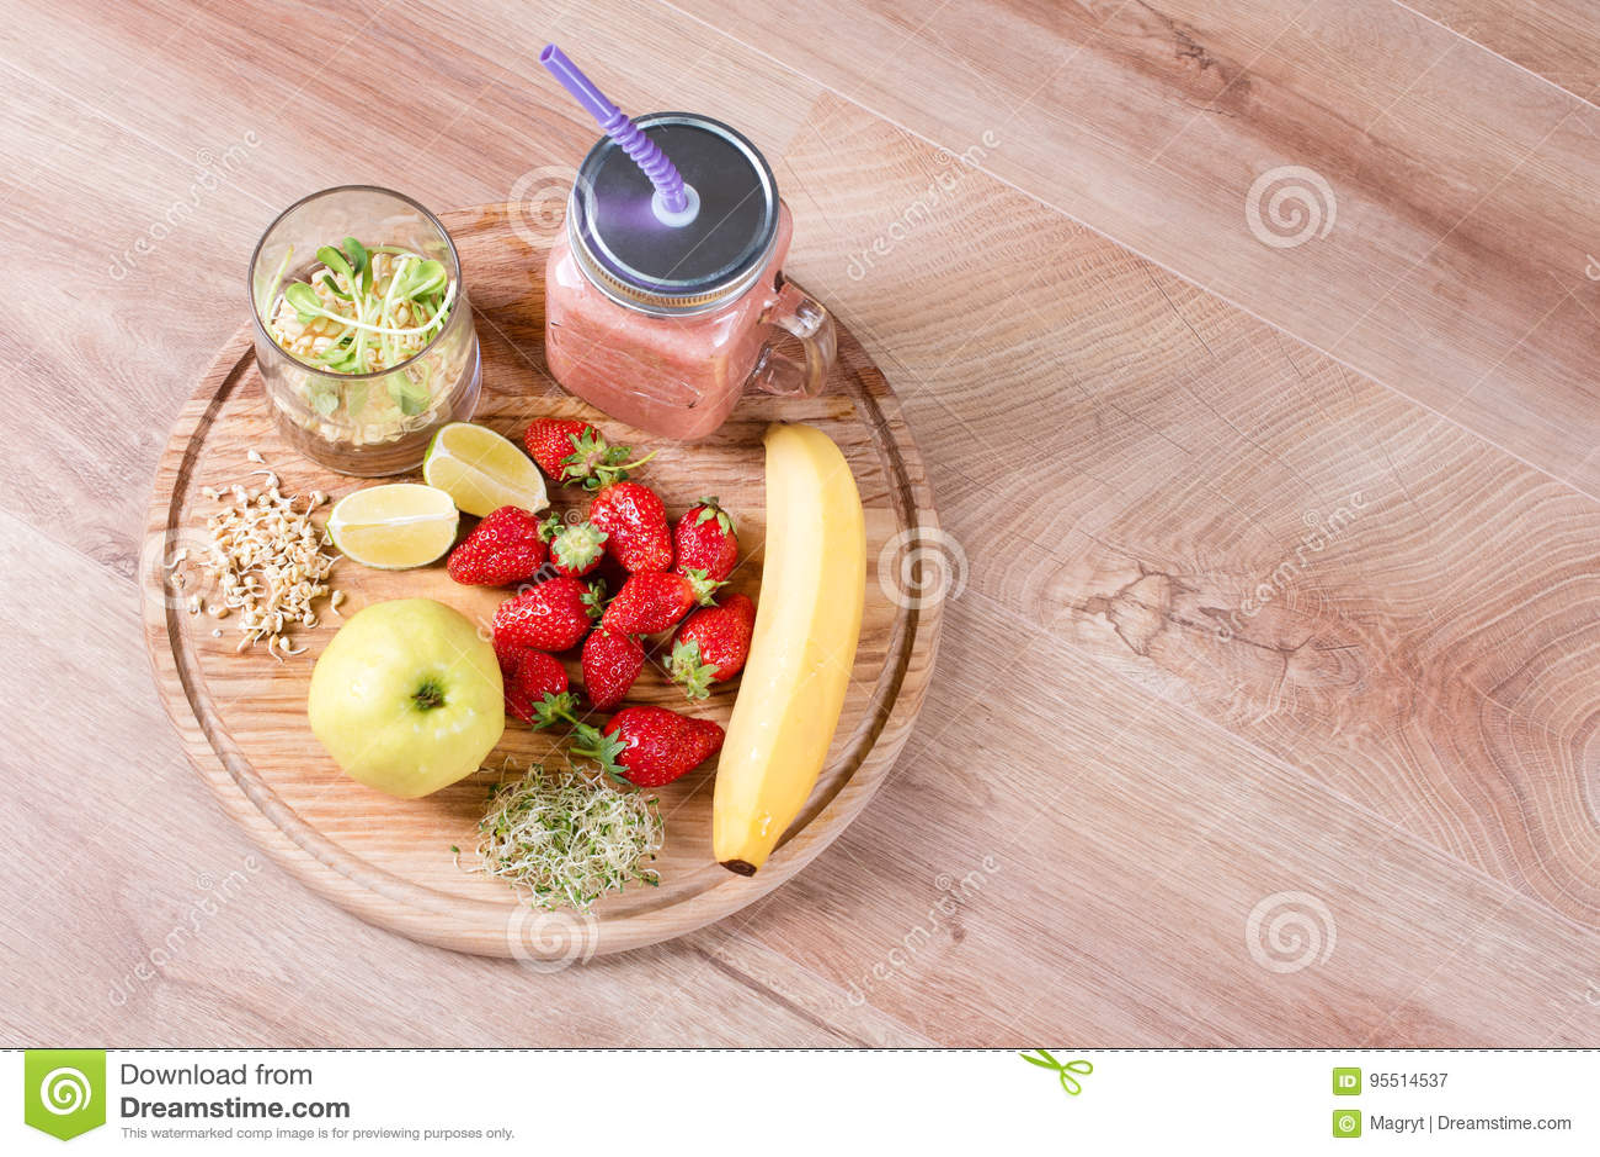 Detox Cleanse Drink Fruits And Berries Smoothie Ingredients